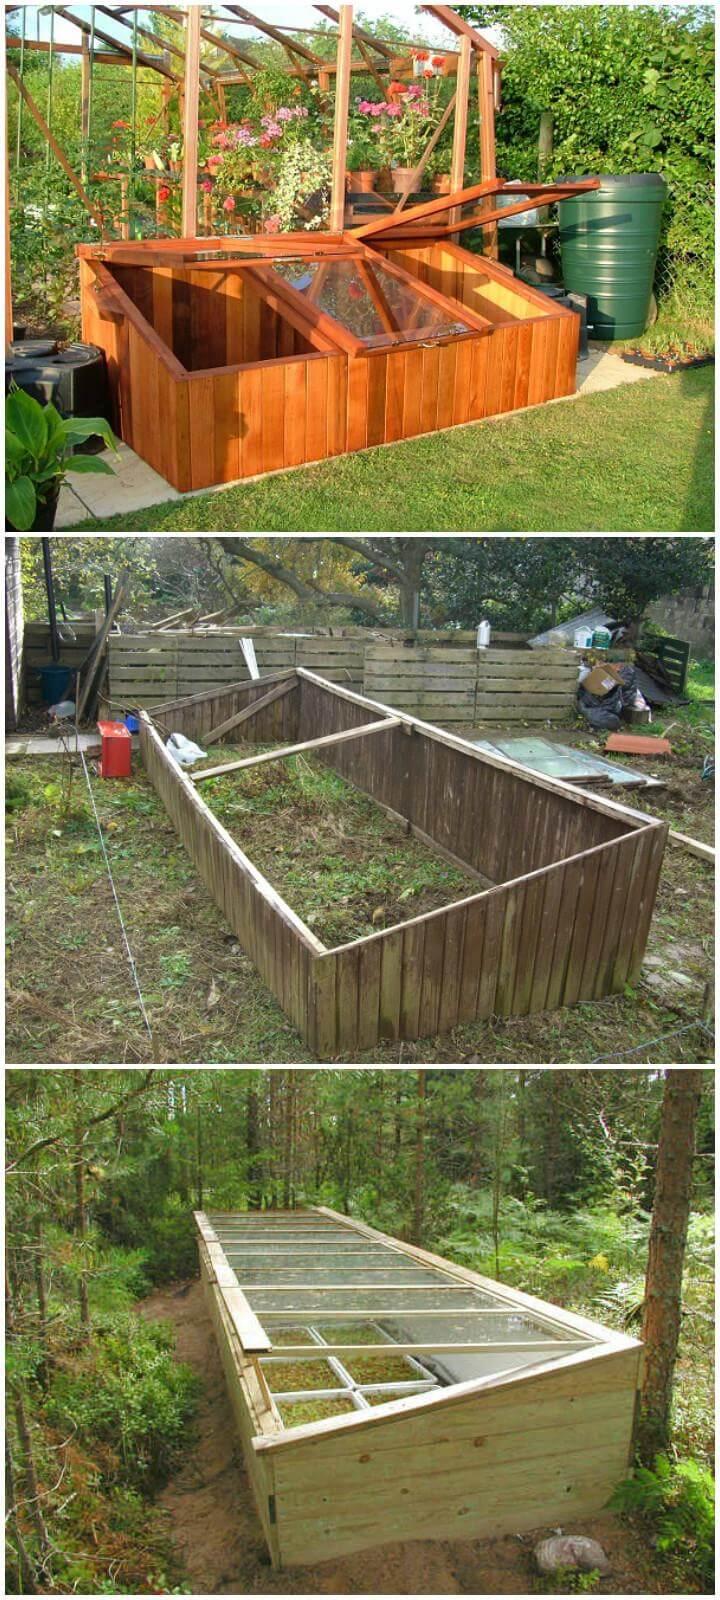 DIY Lasting Elegant Wooden Greenhouse Instructions